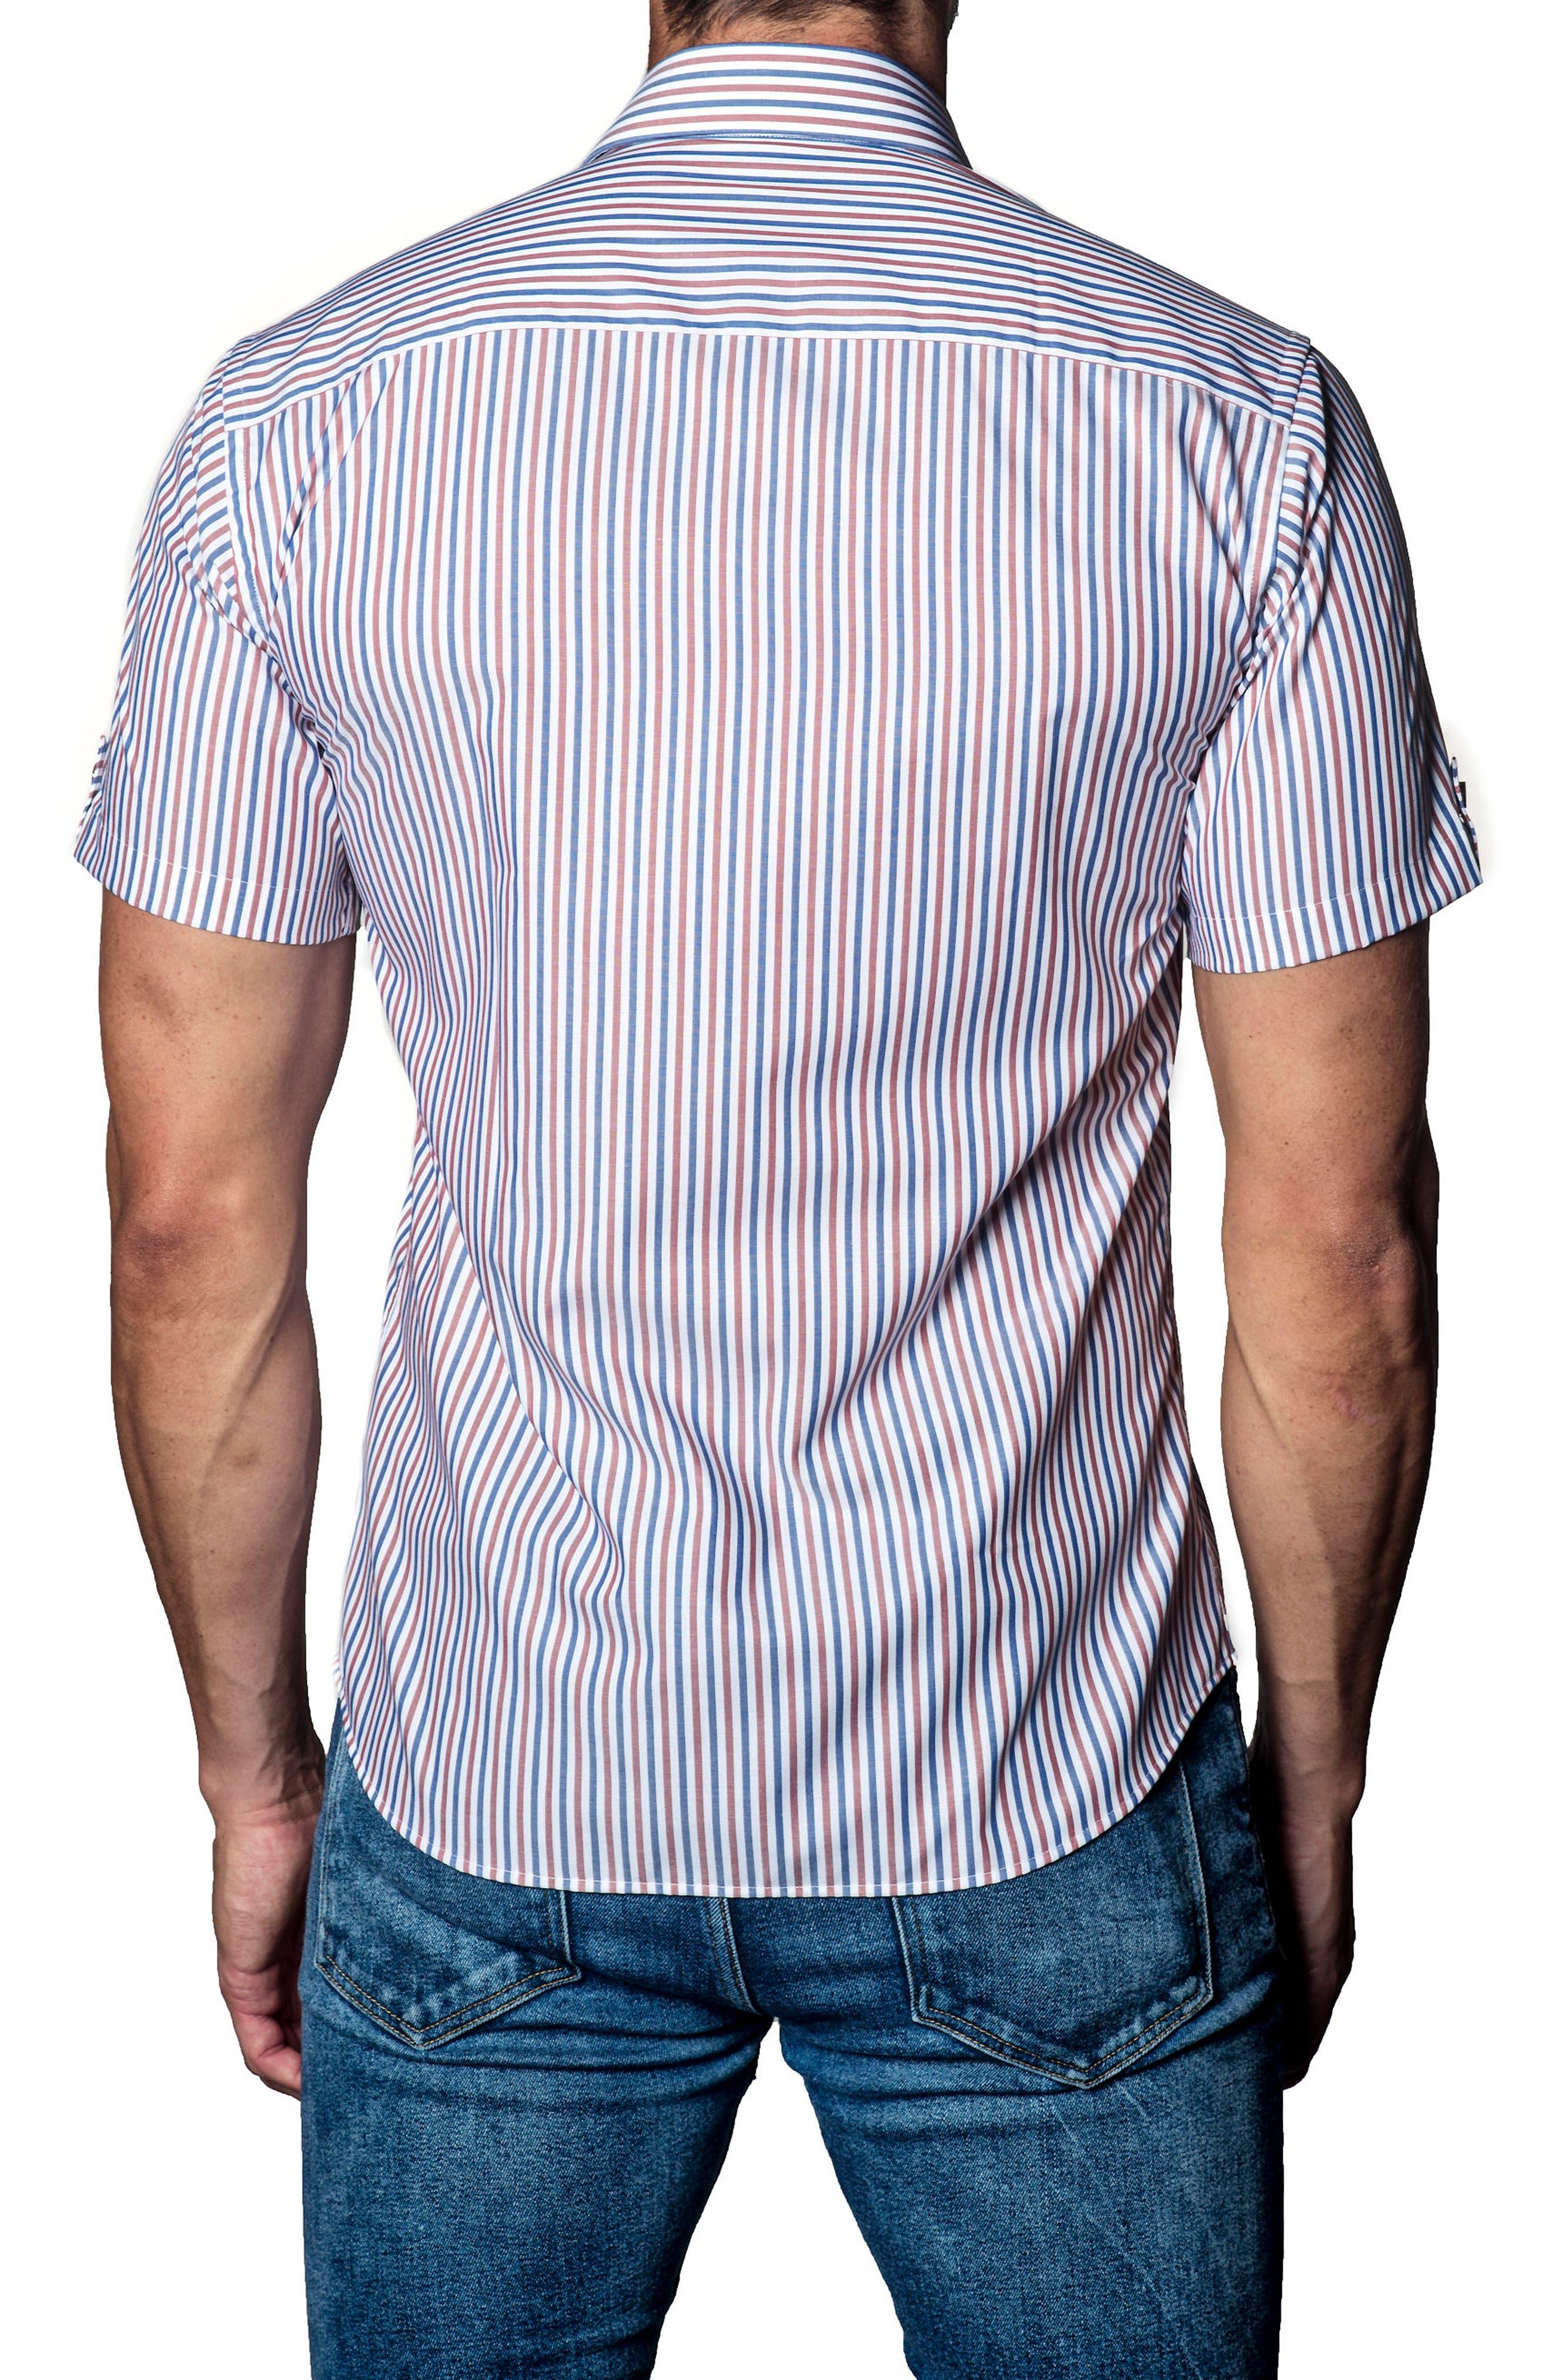 Stripe Sport Shirt,                             Alternate thumbnail 2, color,                             White / Brown/ Blue Stripe